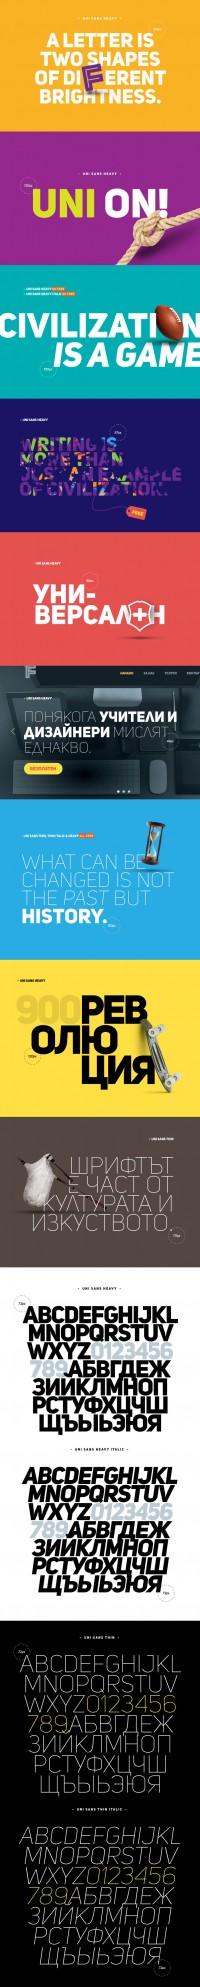 Uni Sans - Free Font - FreebiesXpress